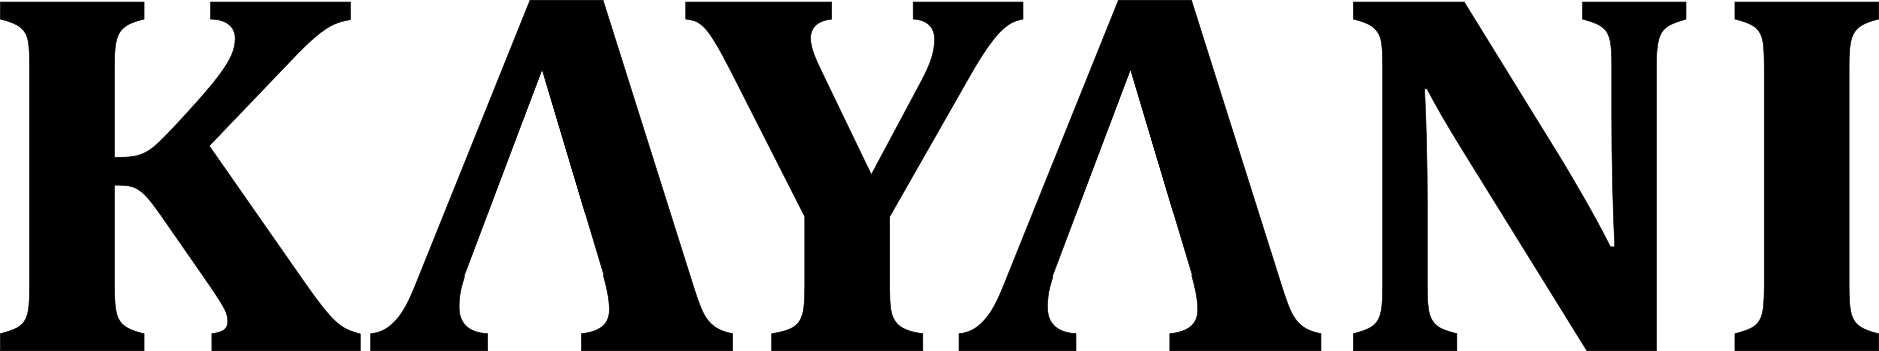 Kayani